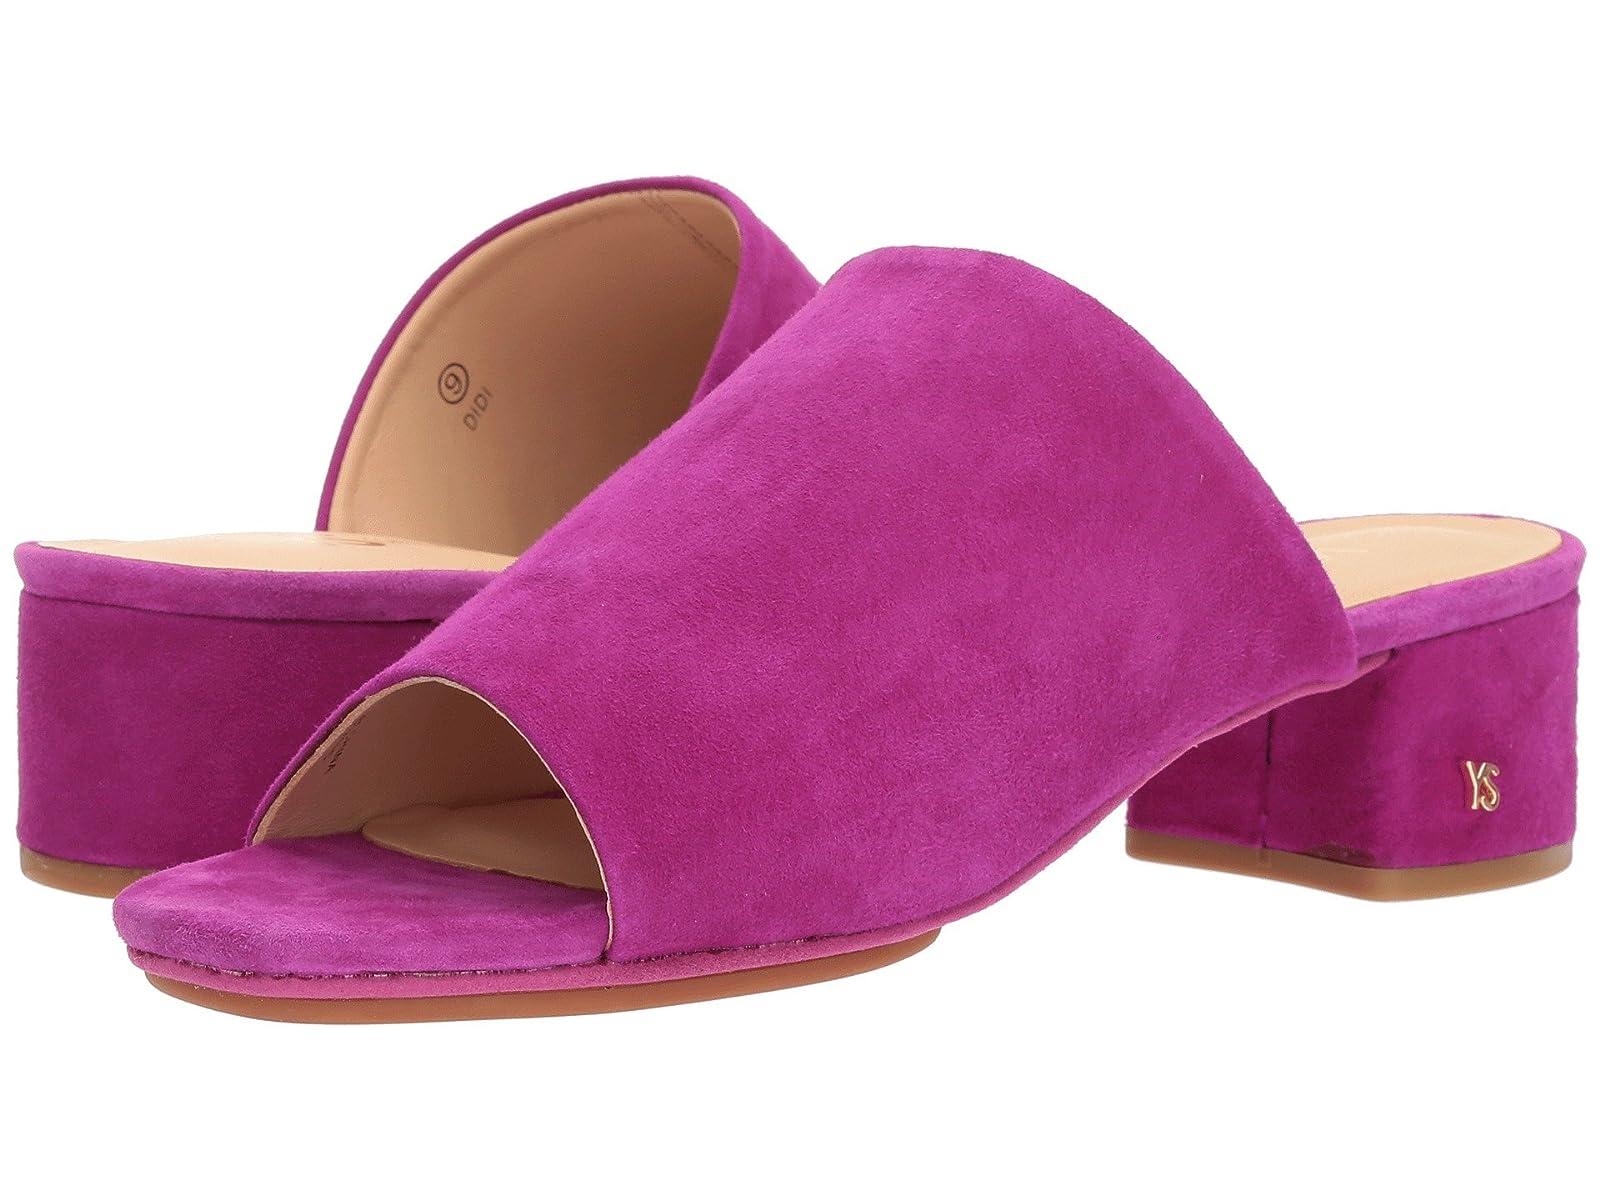 Yosi Samra DidiCheap and distinctive eye-catching shoes